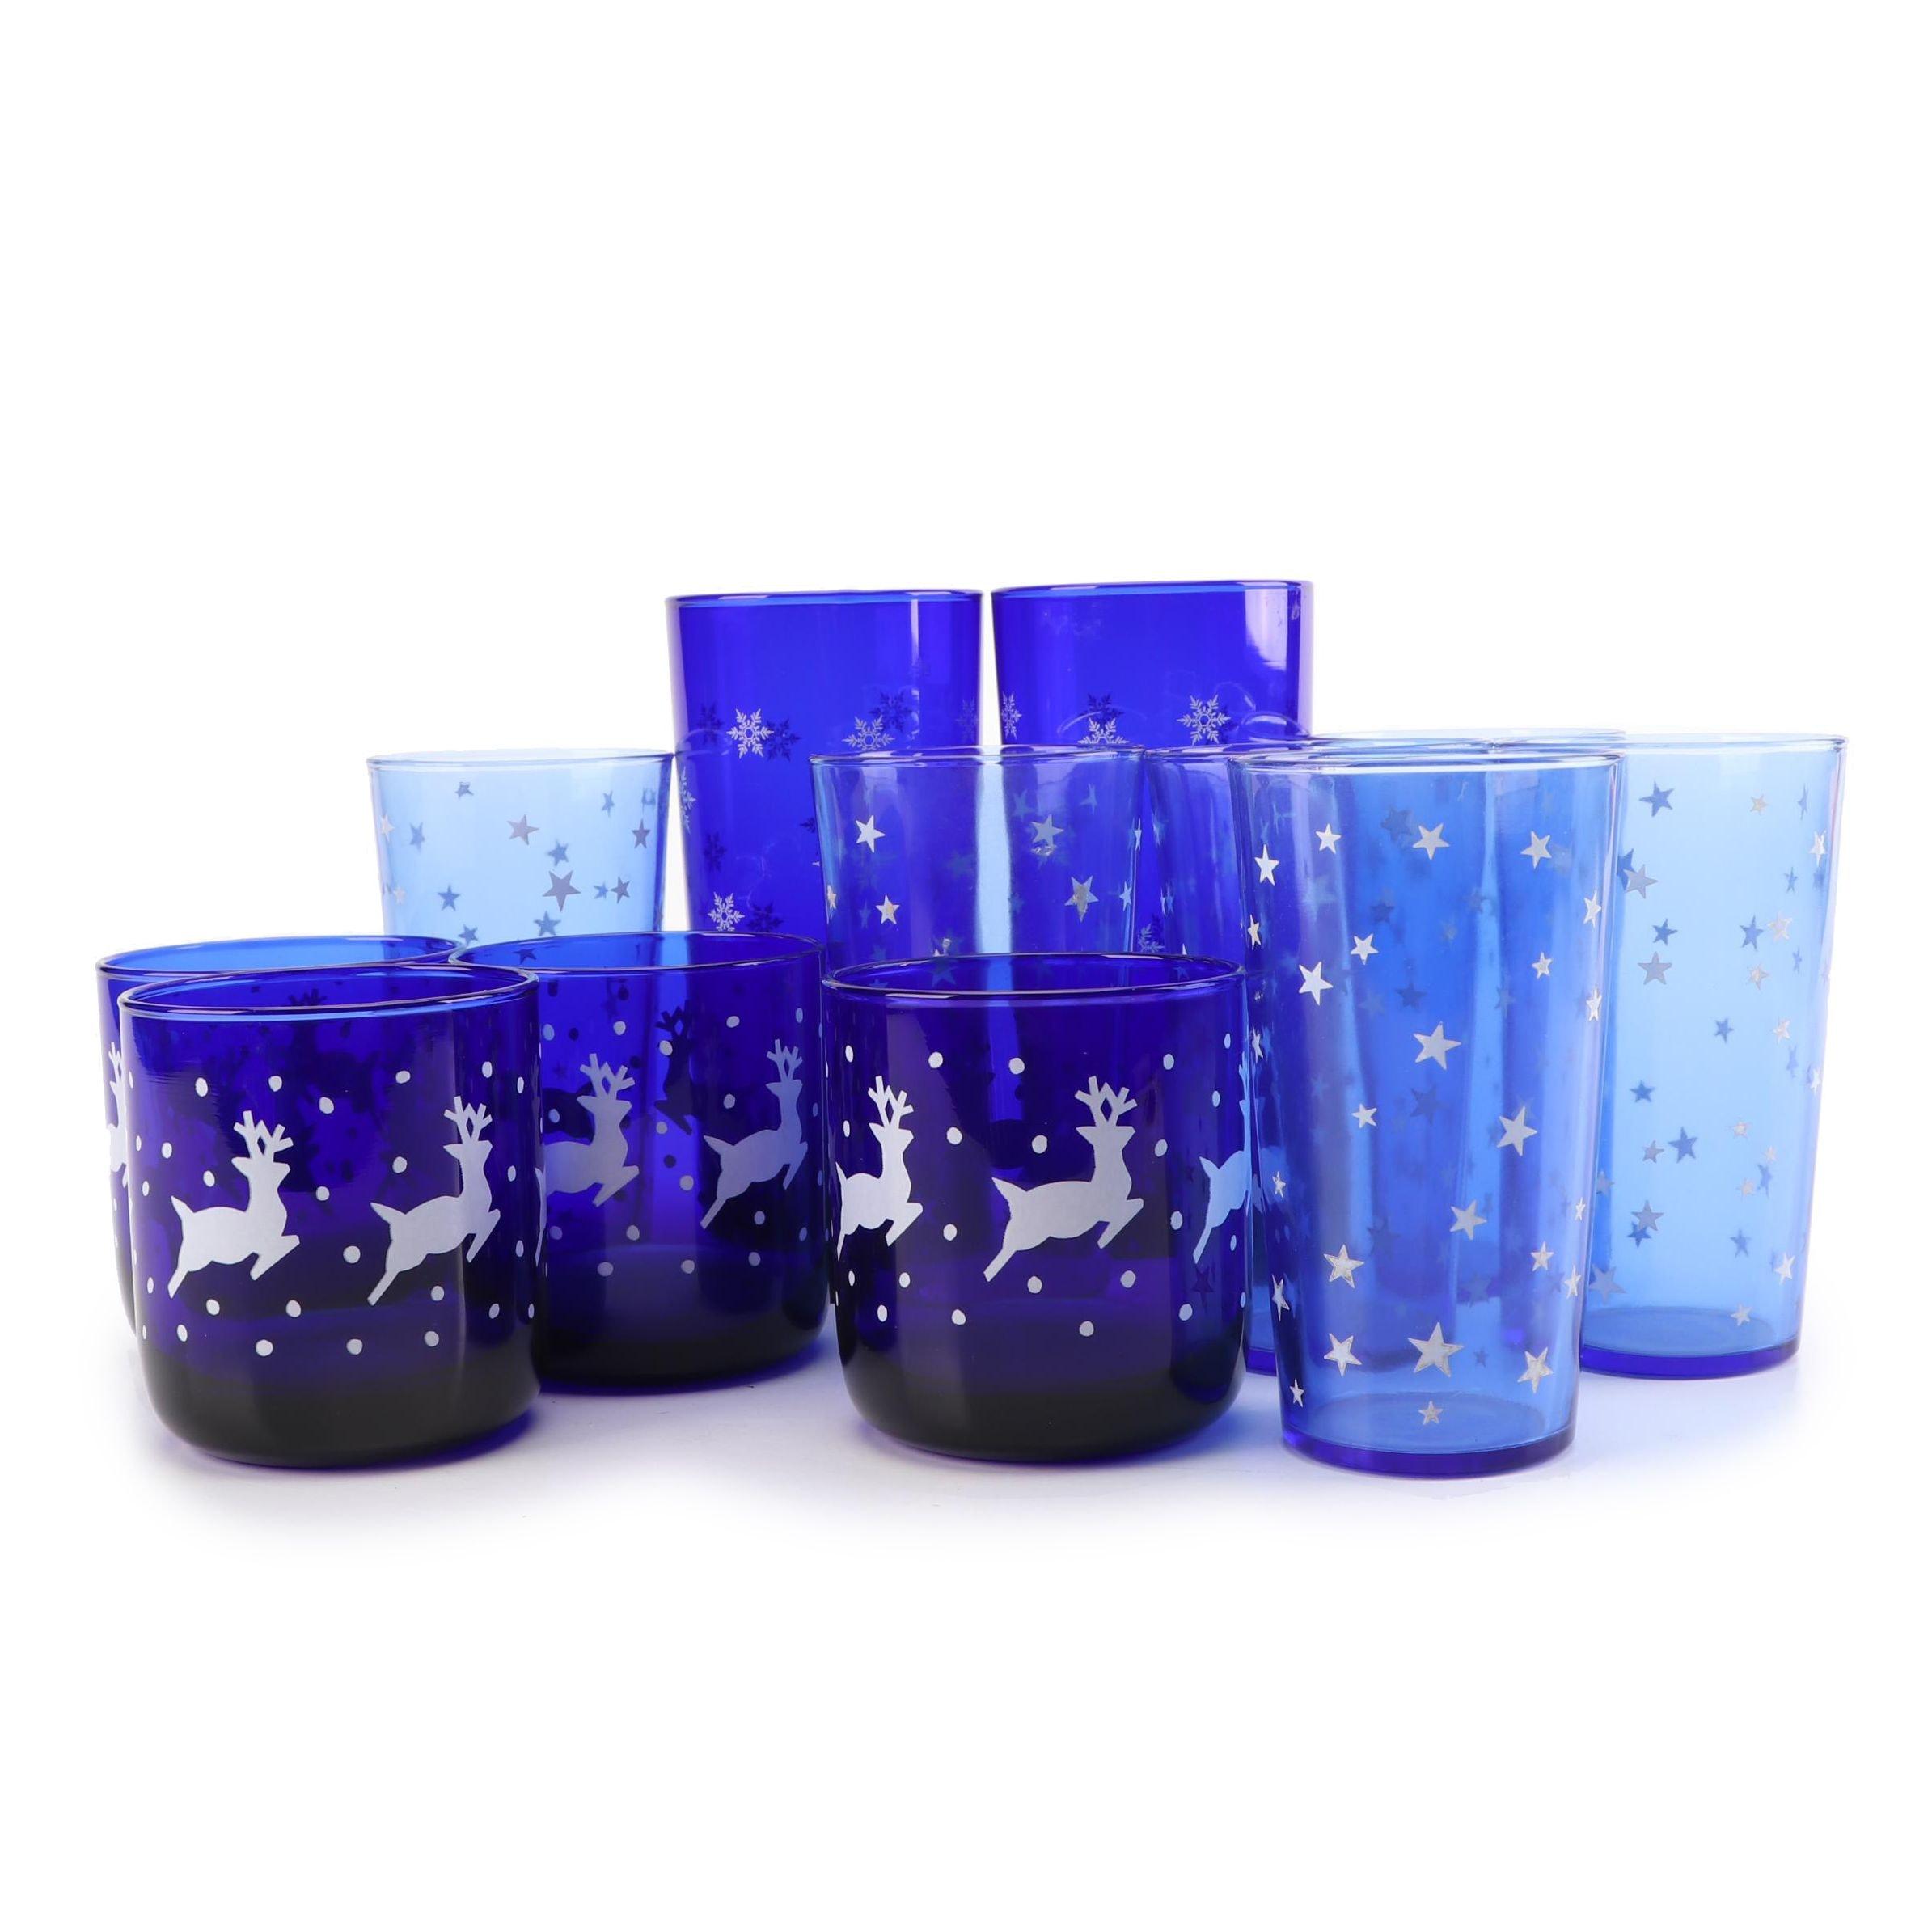 Vintage Cobalt Star, Snowflake and Reindeer Motif Glassware featuring Libbey